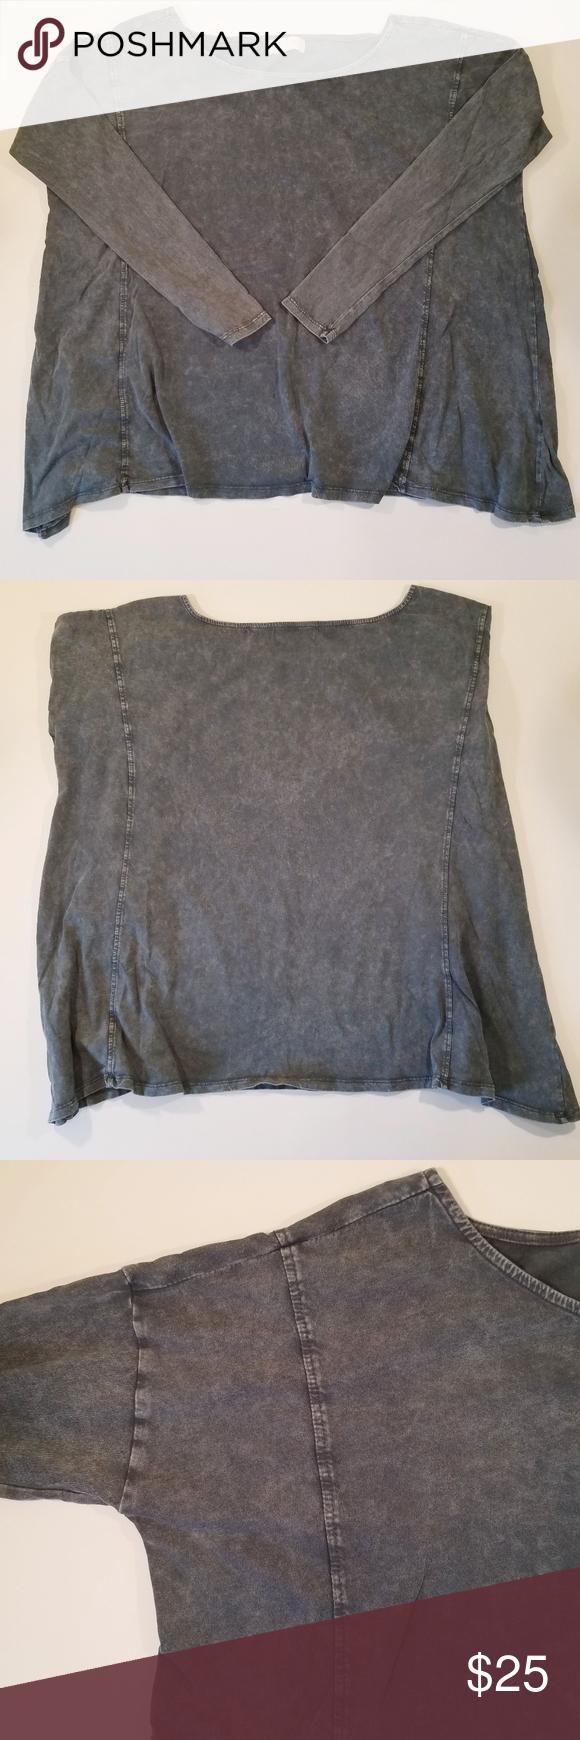 Altarud state acid wash shirt in poshmark fab phila finds